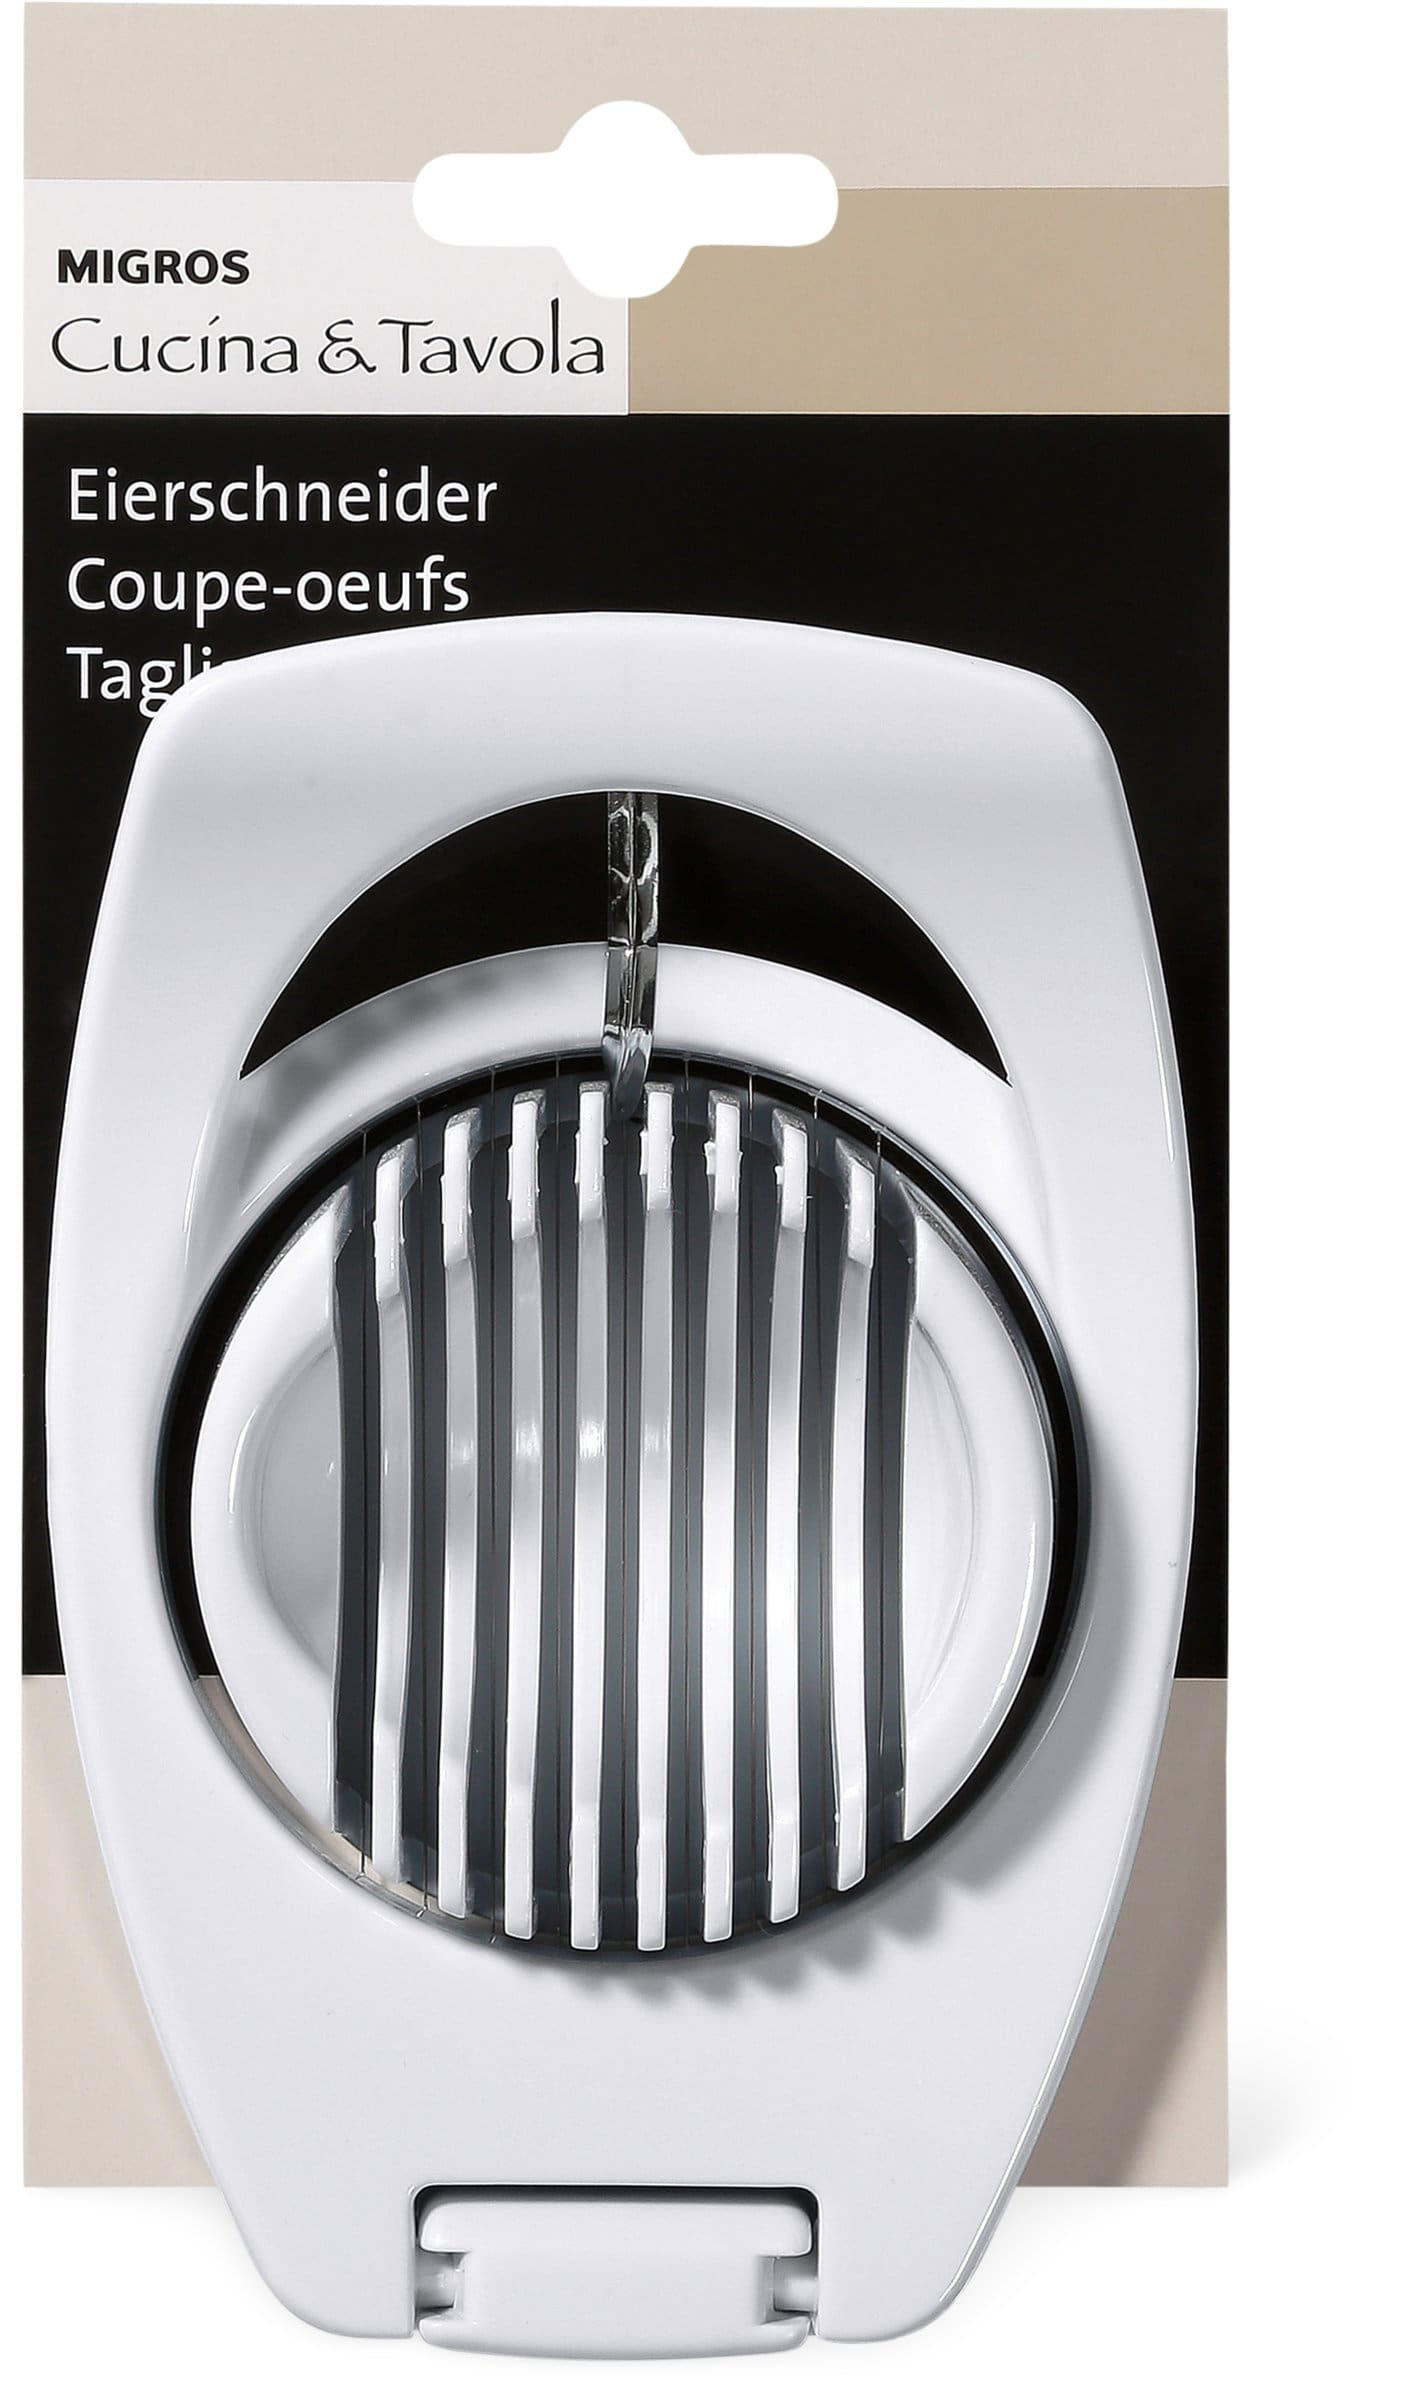 Cucina & Tavola Coup-oeufs